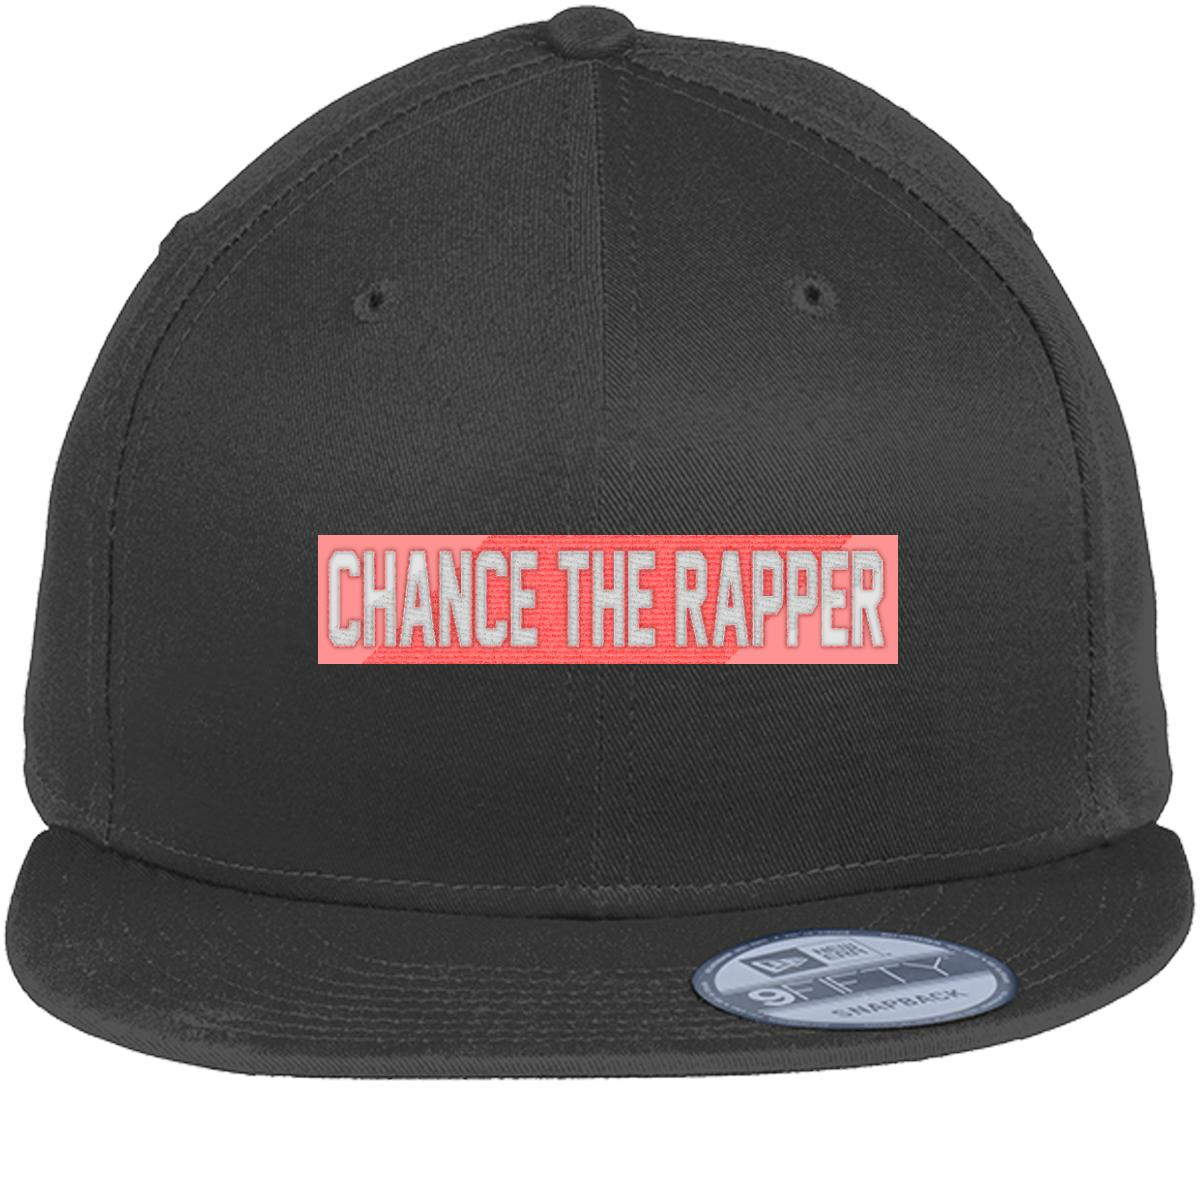 Chance the rapper new era snapback cap embroidered jpg 1200x1200 Chance the  rapper green hat 82d14f4e8b2b